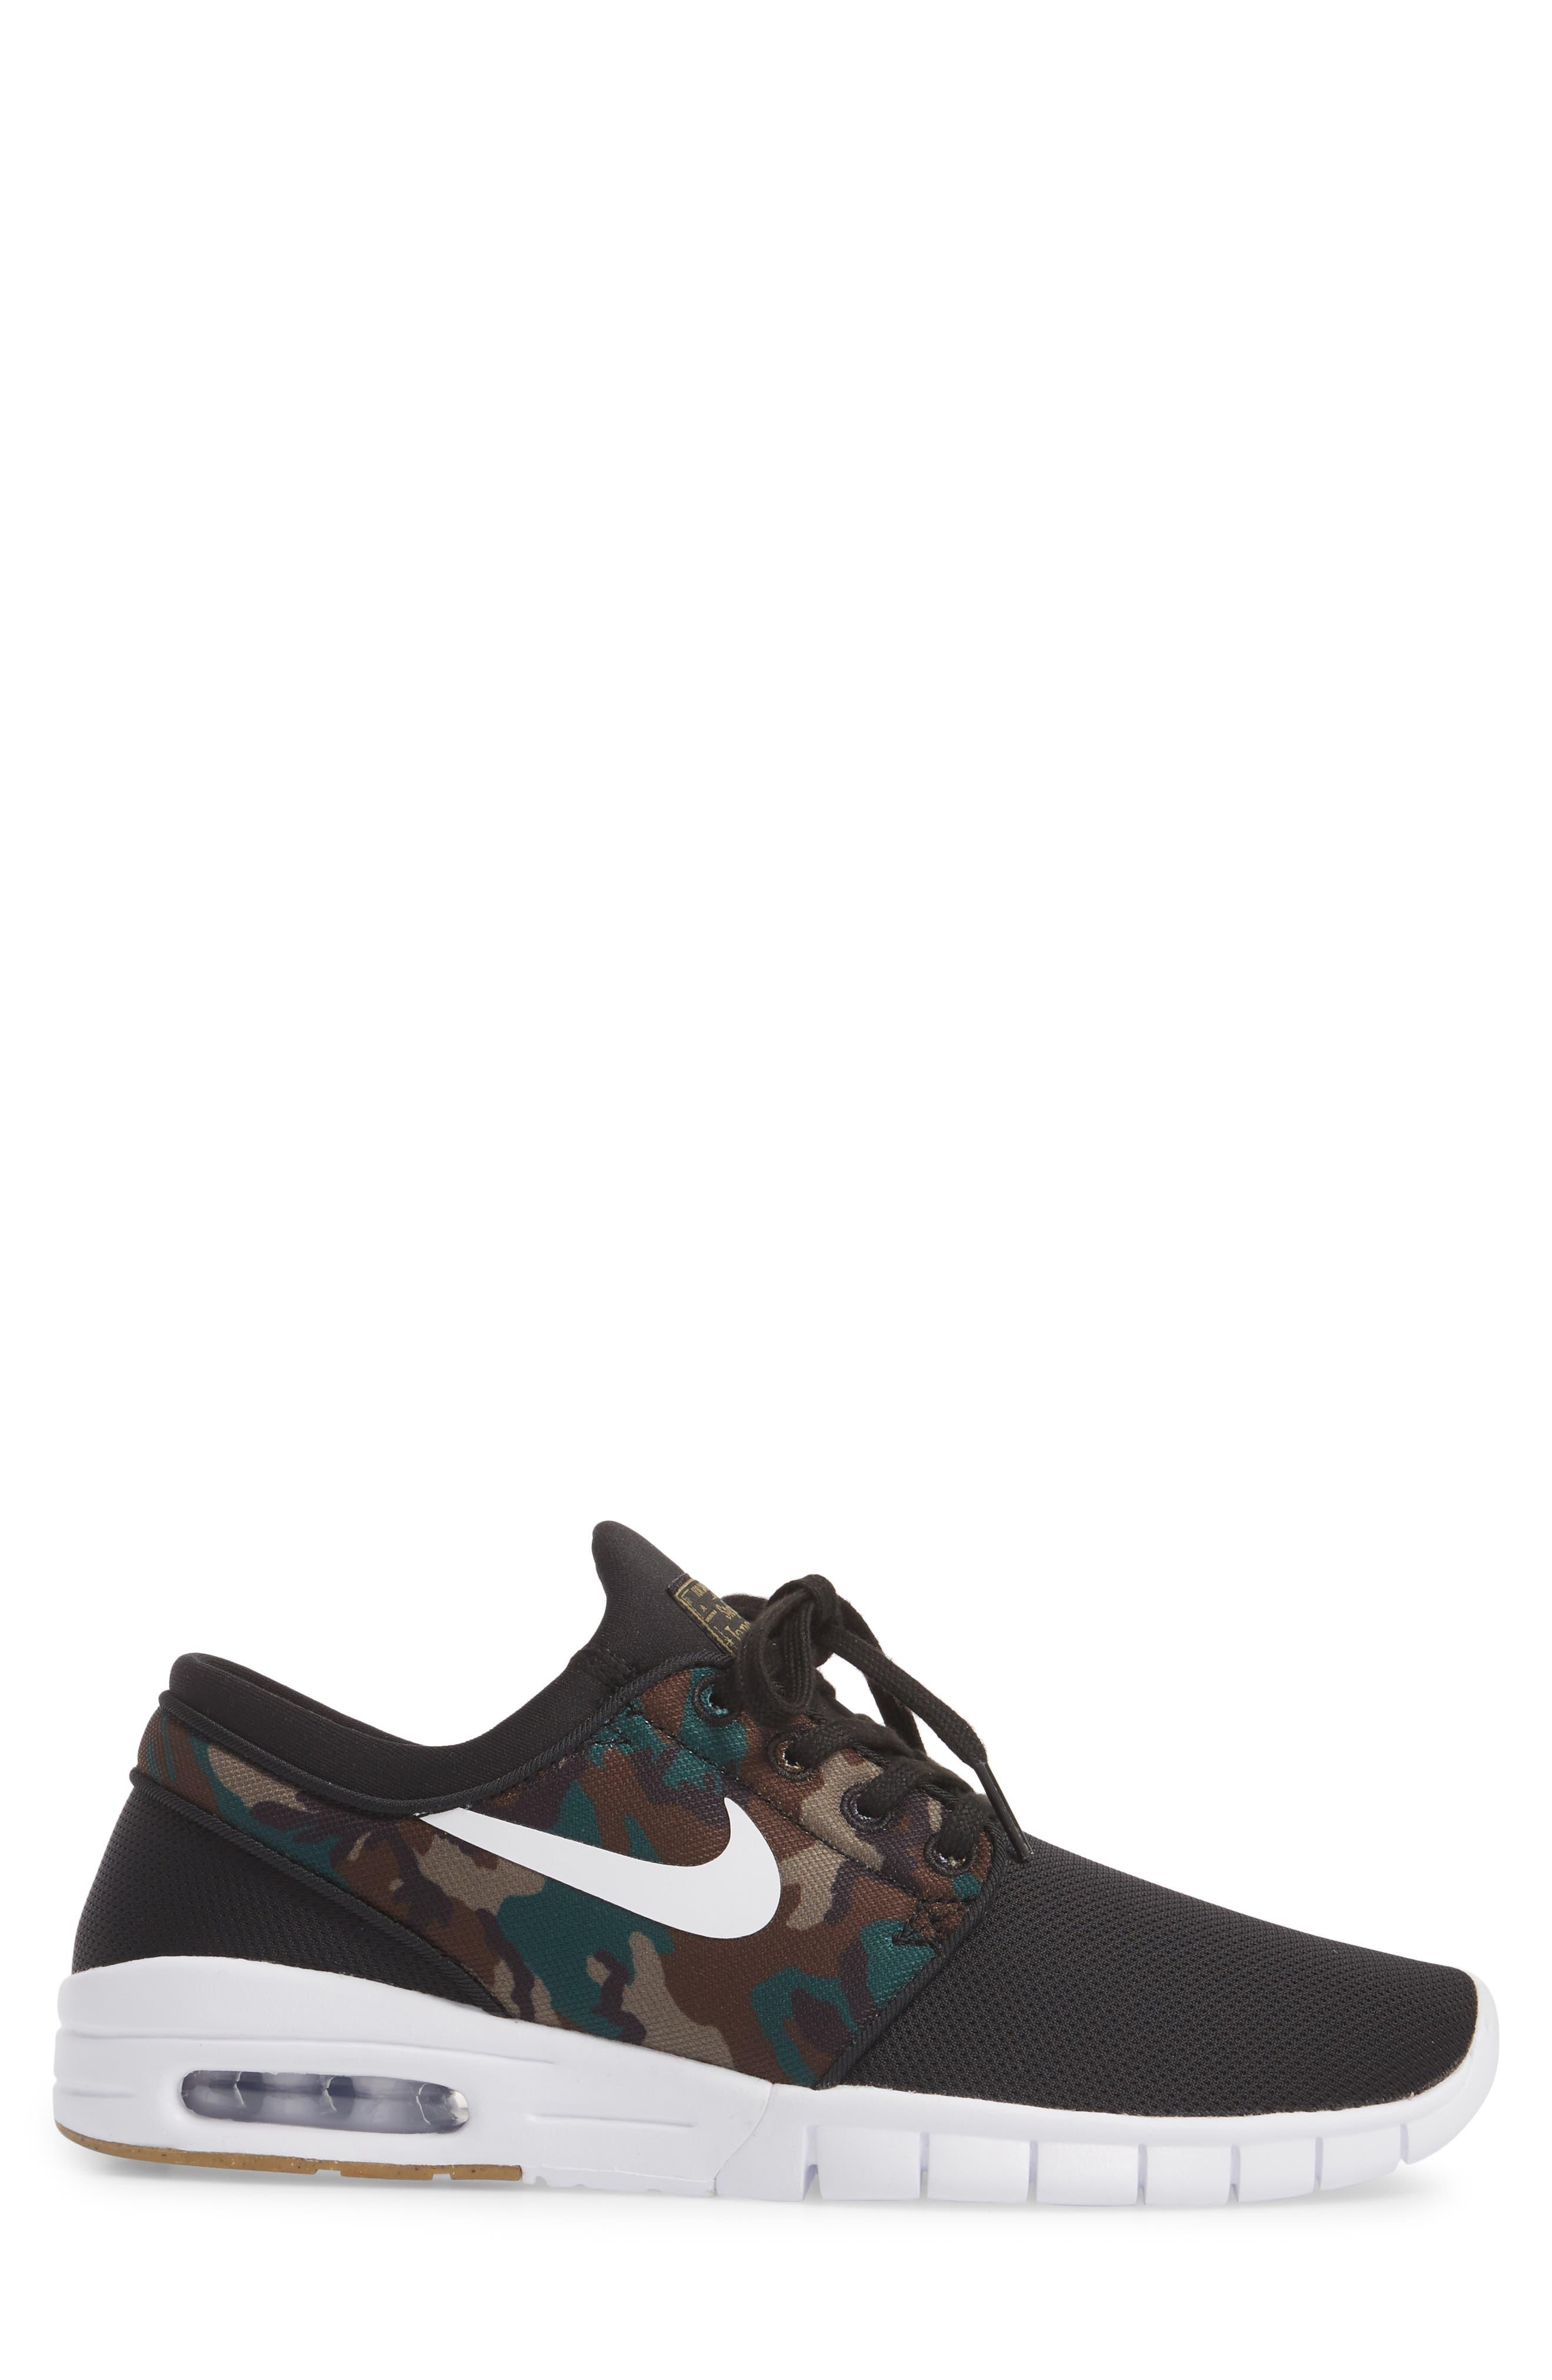 Alternate Image 3  - Nike 'Stefan Janoski - Max SB' Skate Shoe (Men)